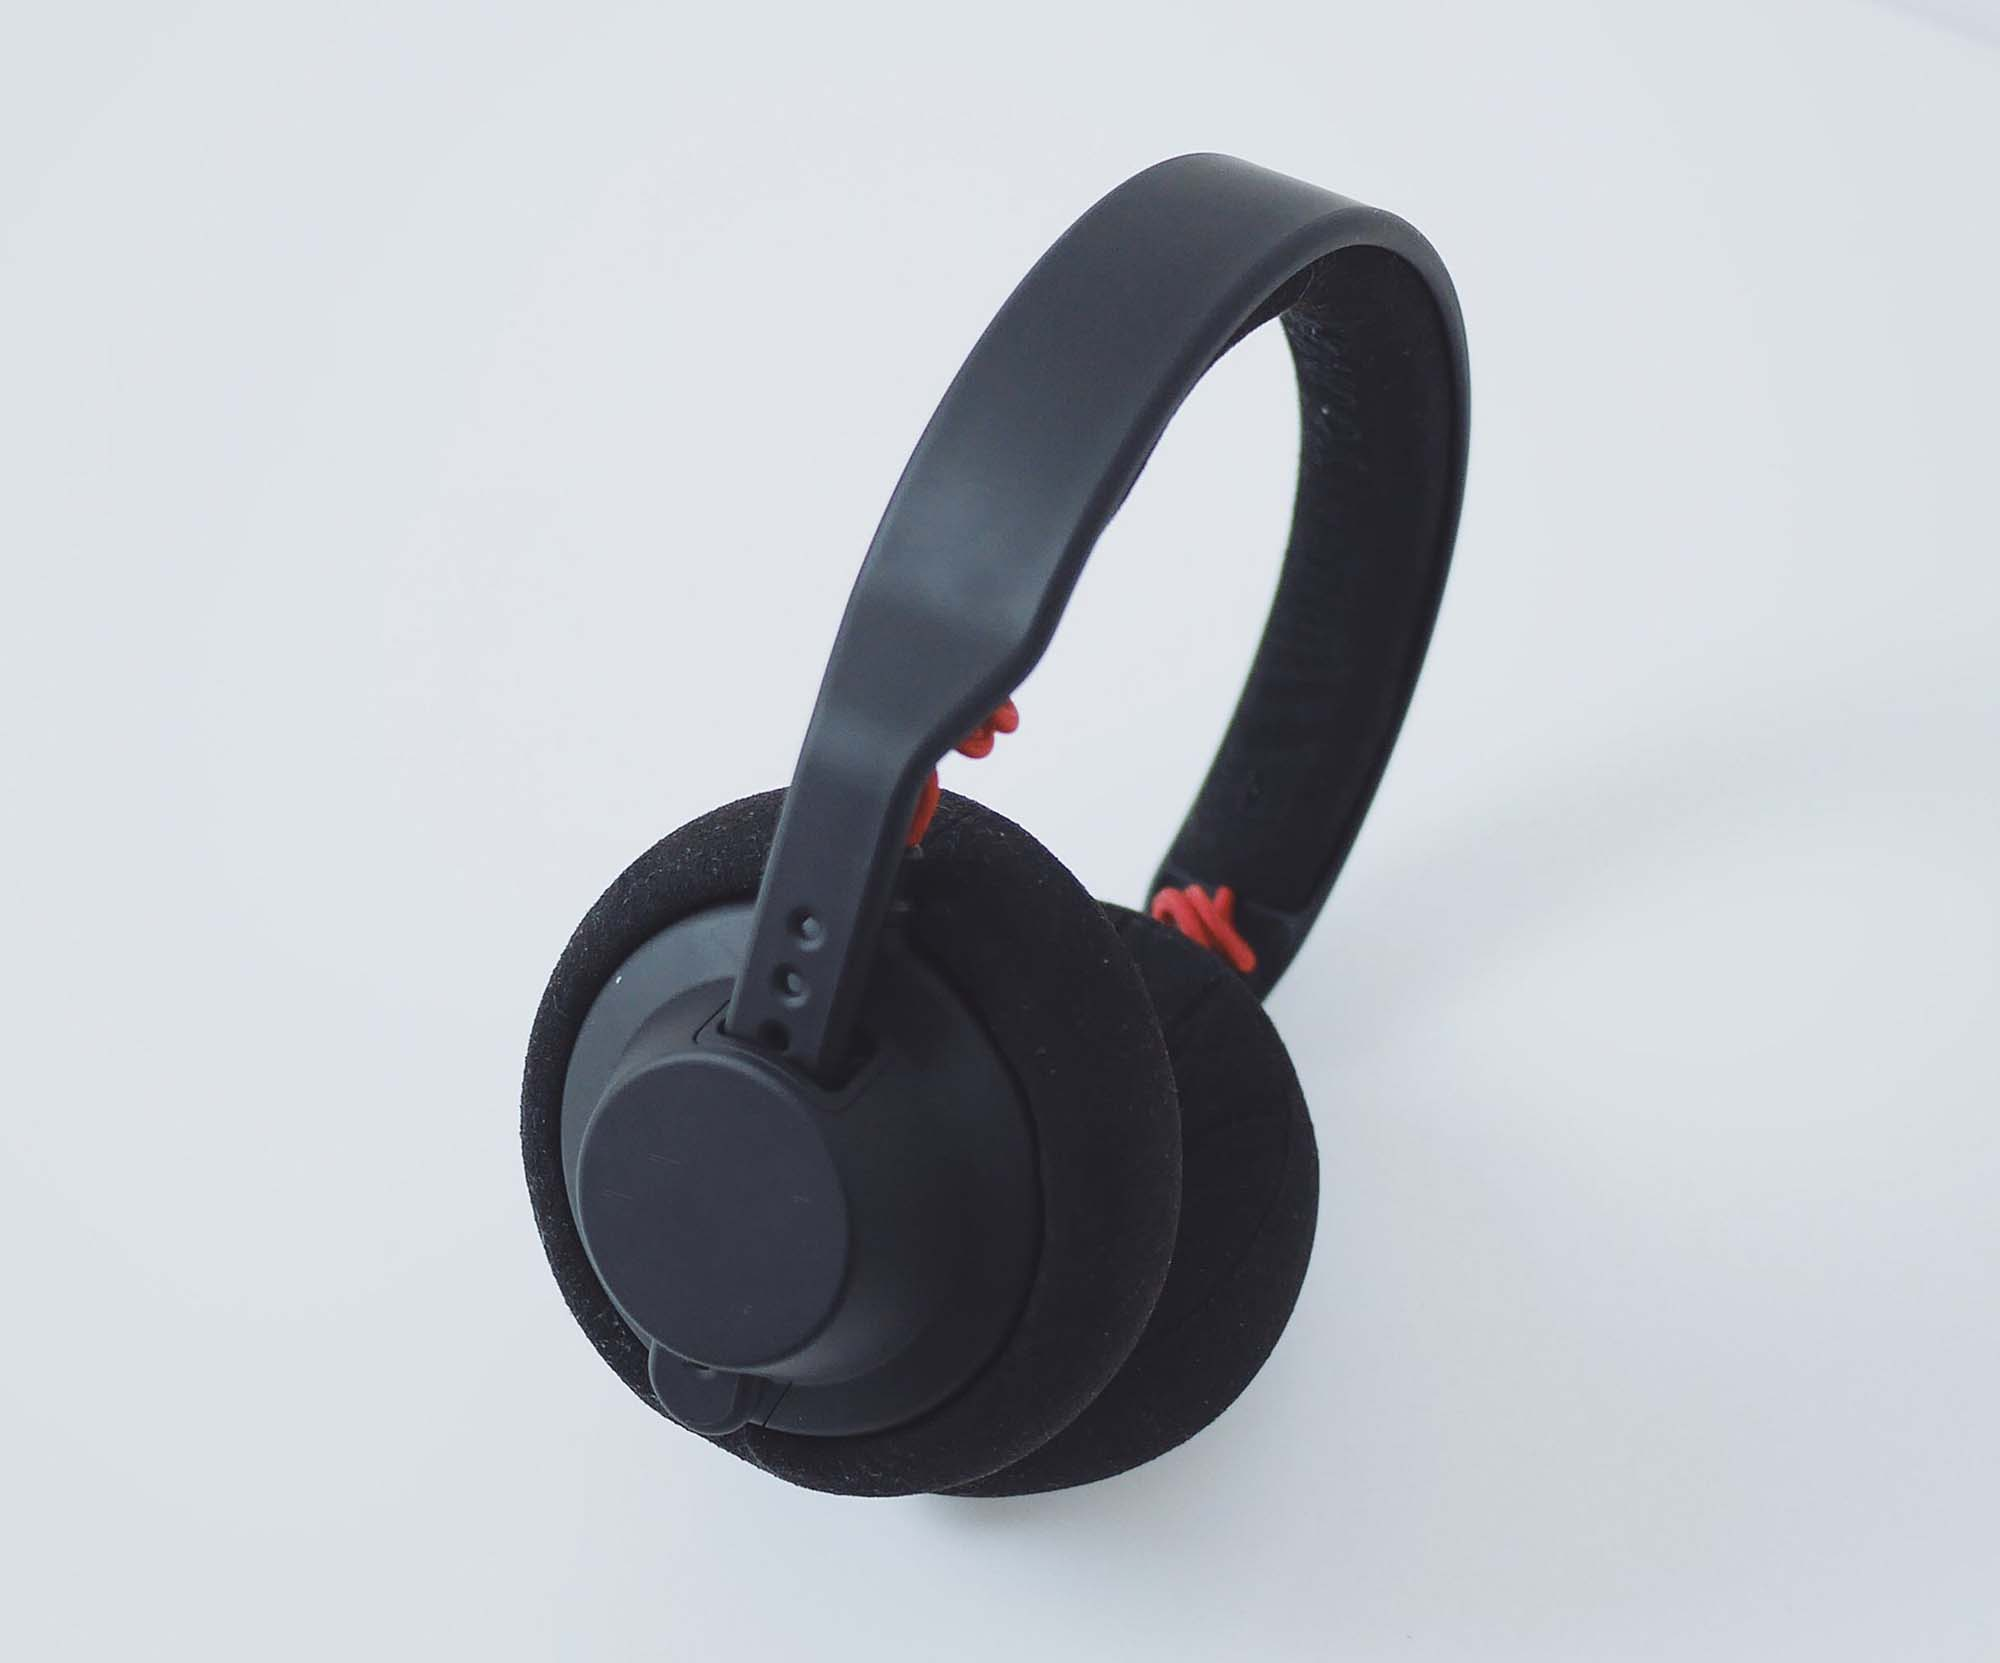 Head-Phone Mockup